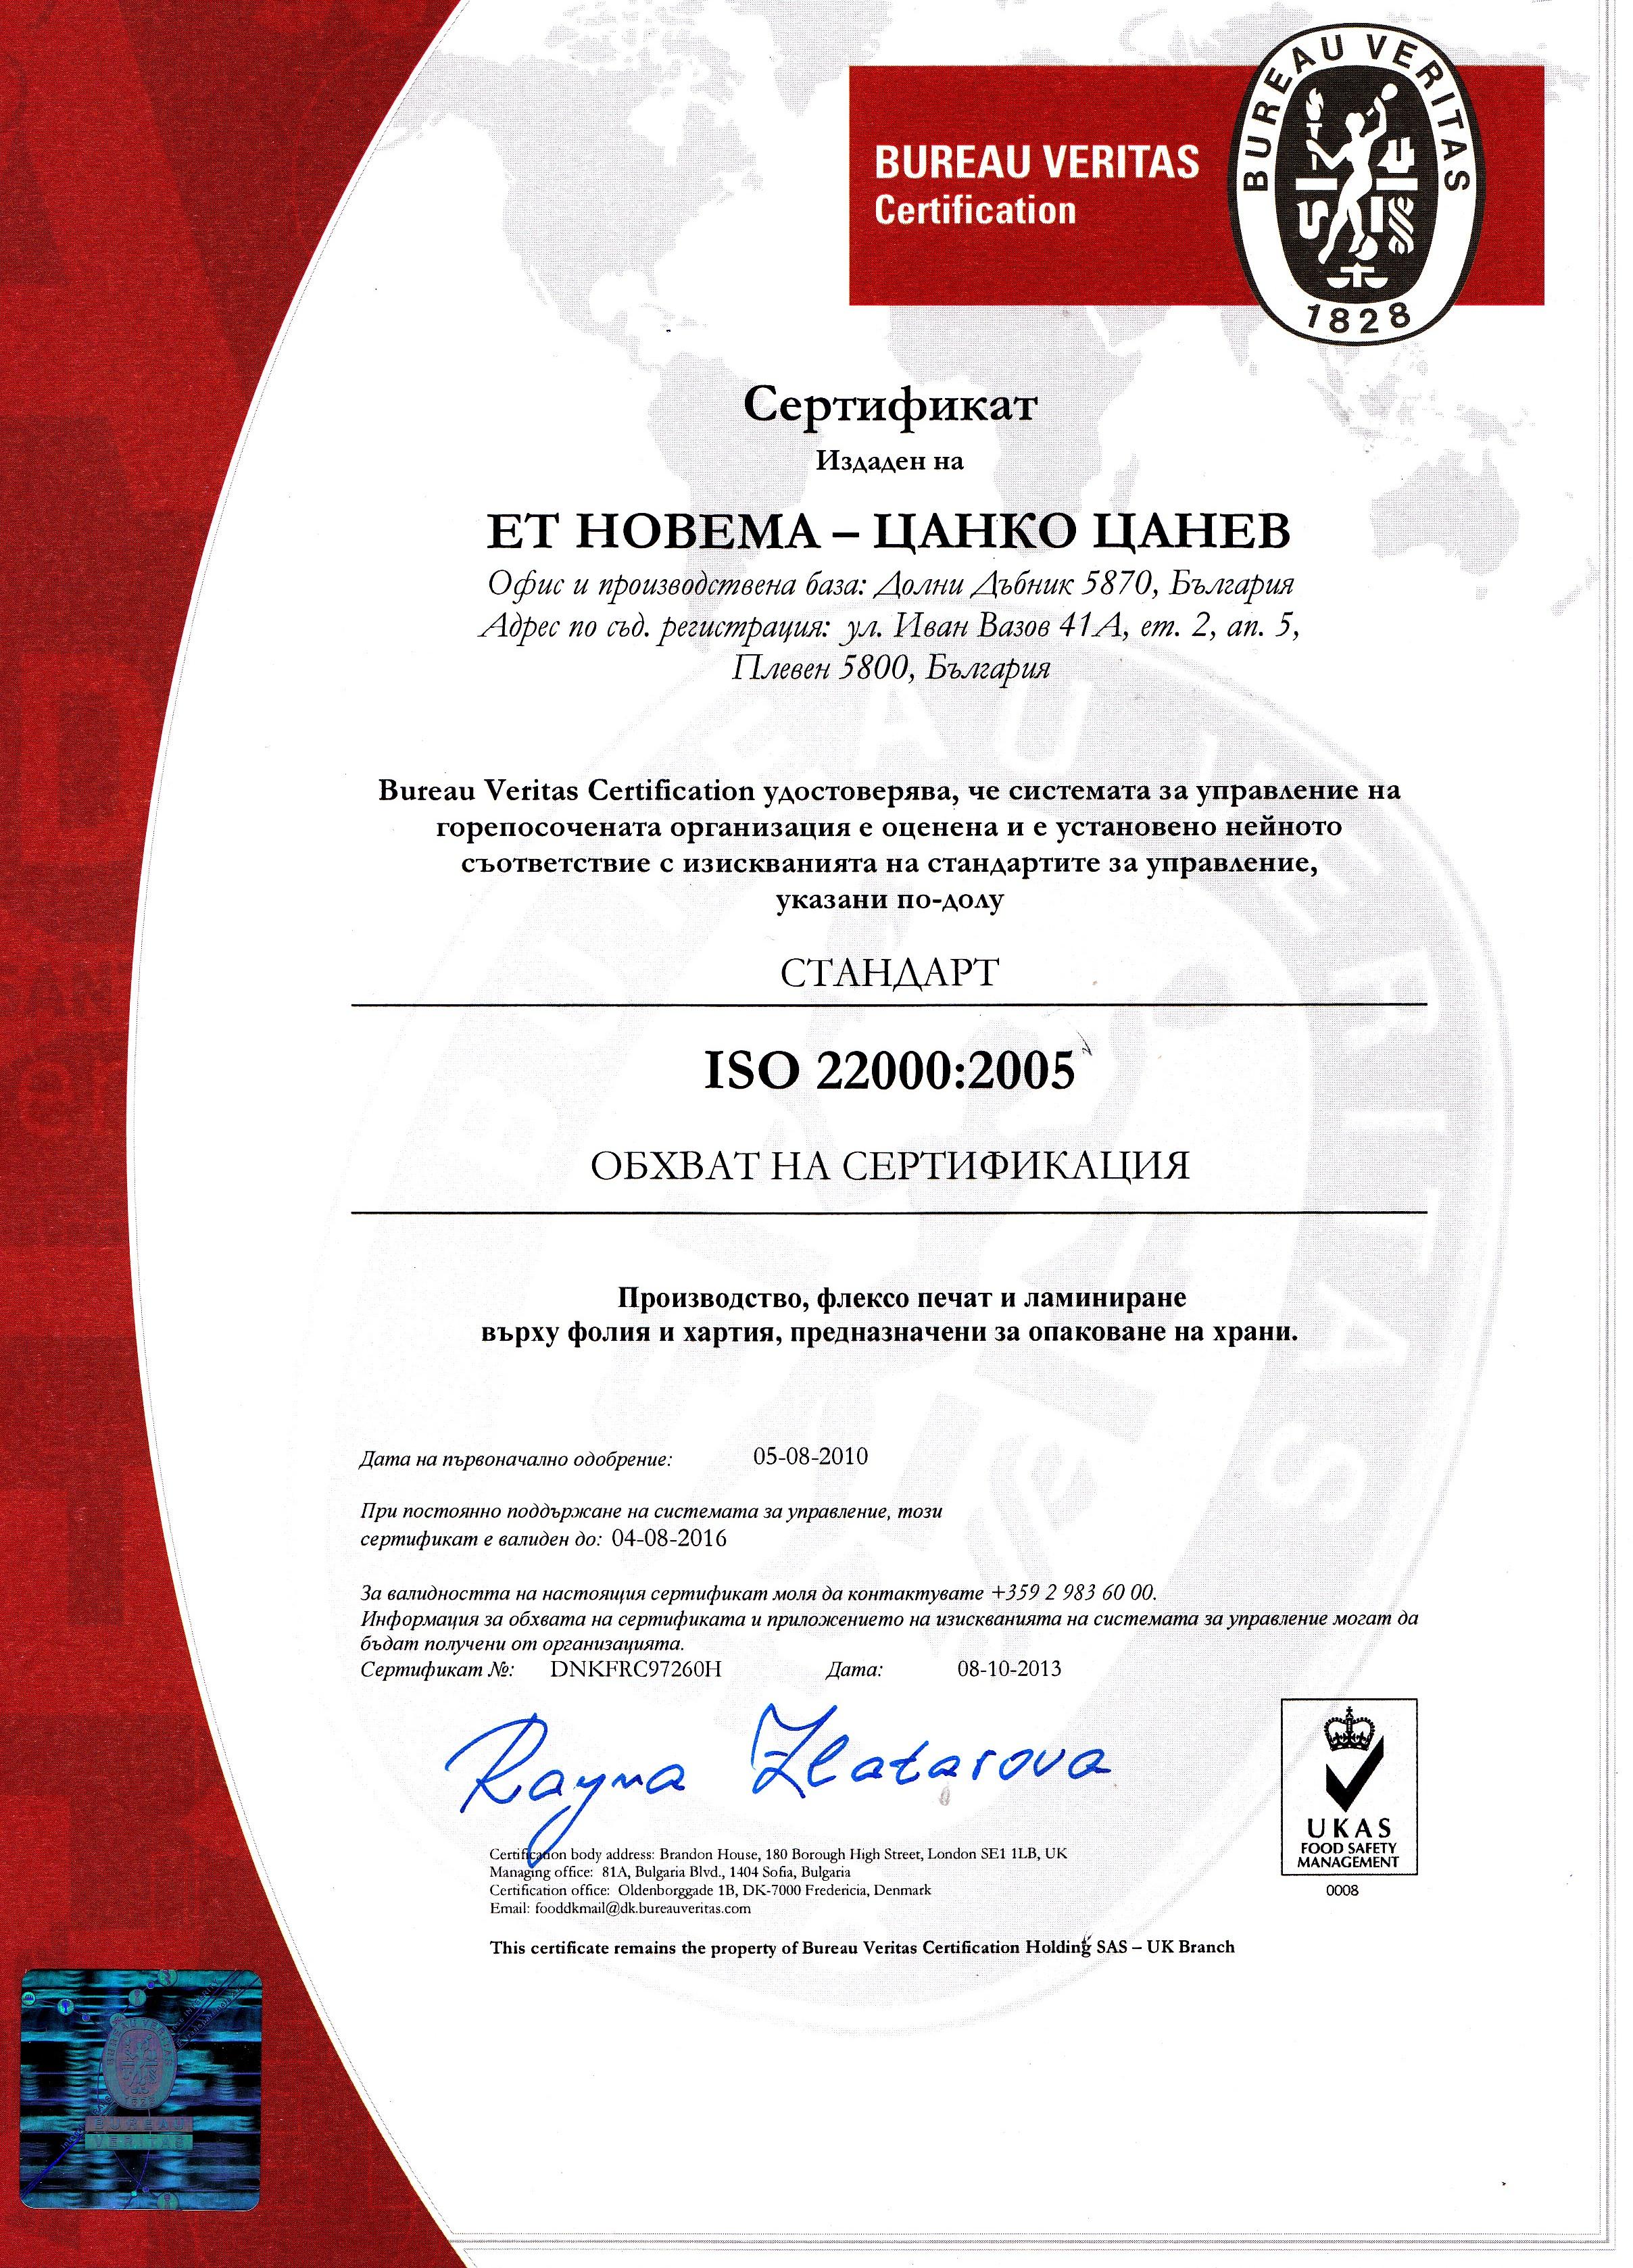 сертификат за качество на Новема принт